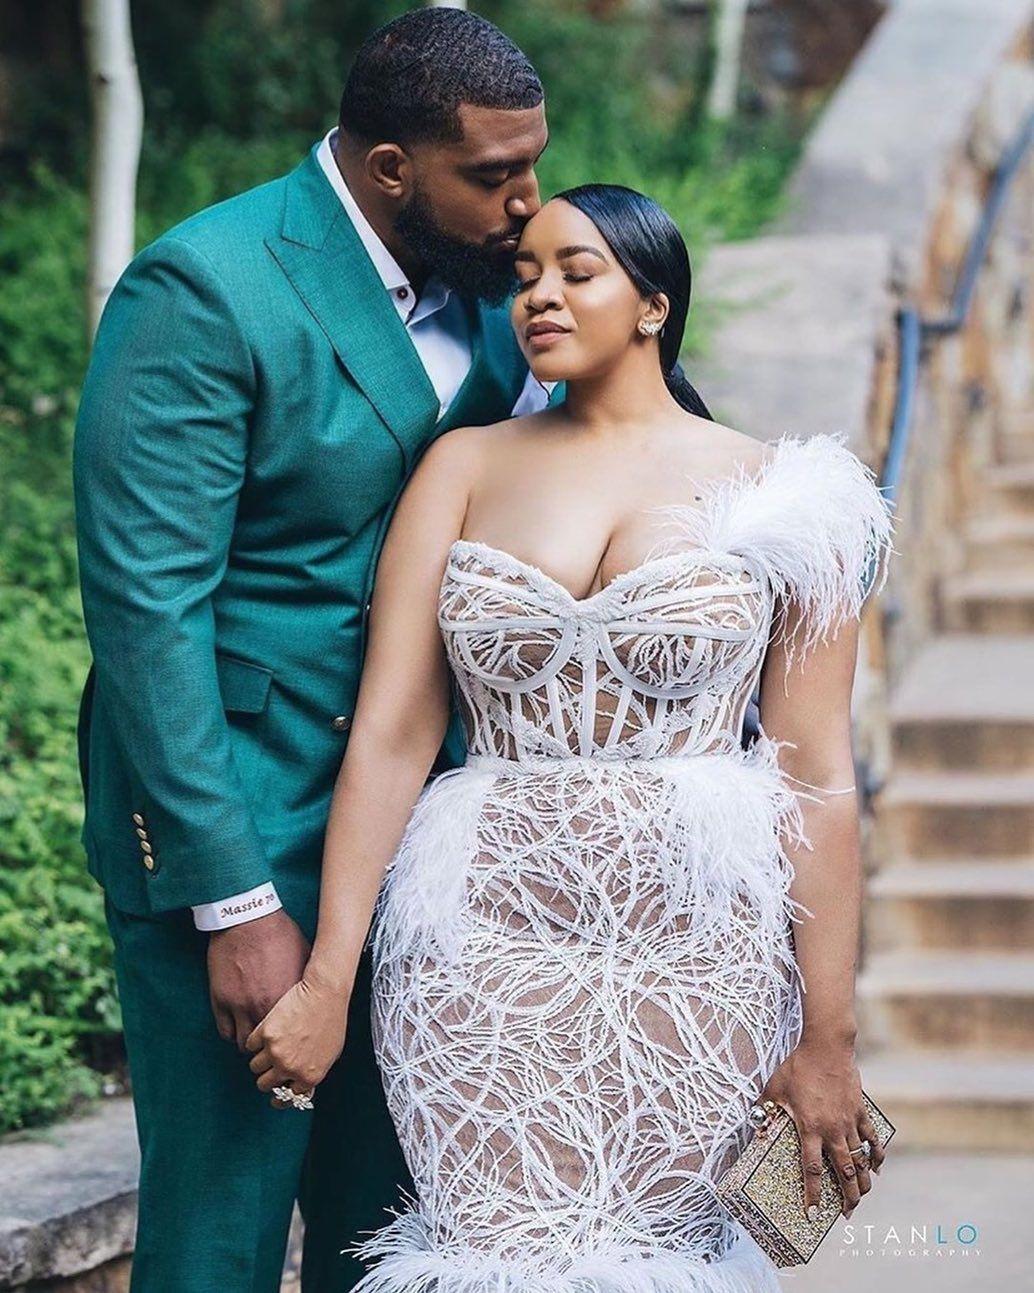 "KrimeWithKissy on Instagram: ""Her wedding dress is so on point! ��� • The unforgettable @angelera @bigbruh70 ��� Dress @ryanandwalter Photo: @stanlophotography Wedding…"""